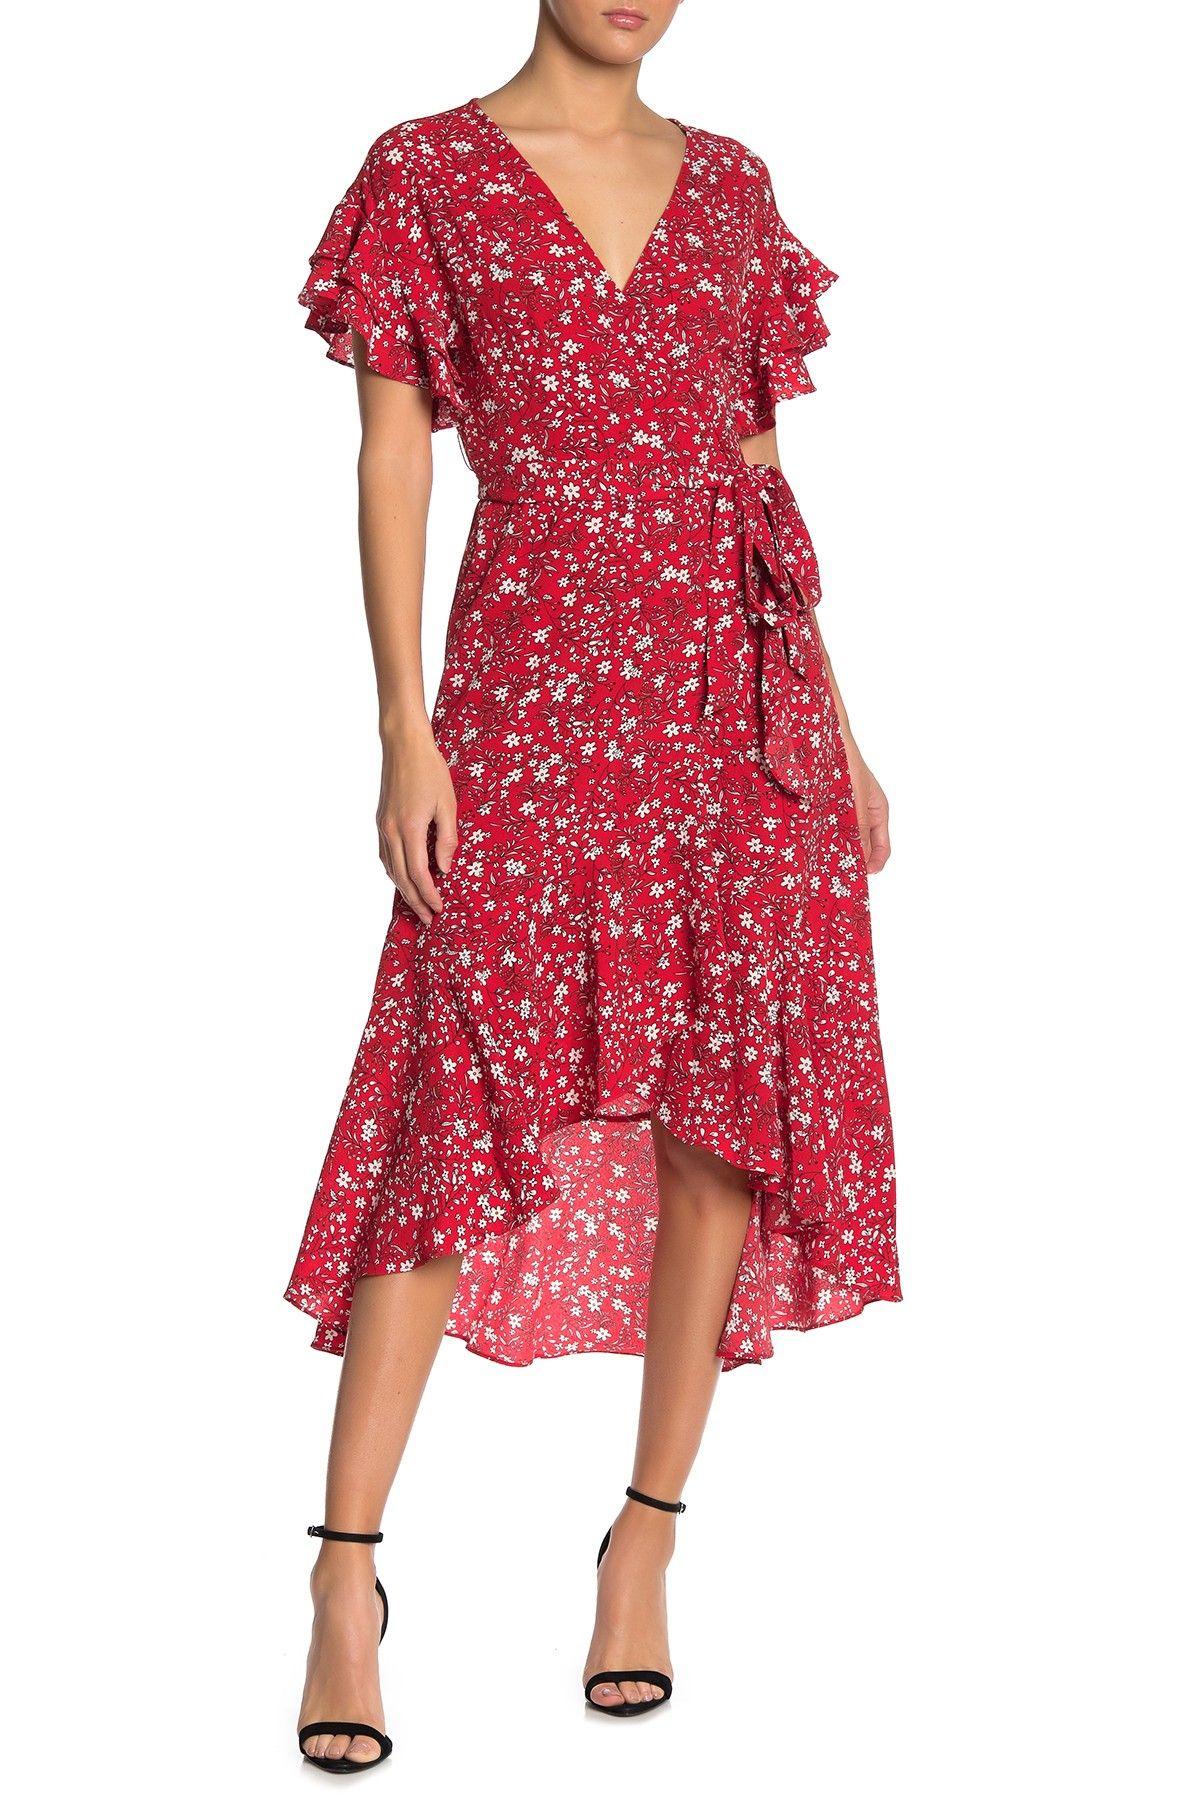 Max Studio Ruffle Crepe High Low Wrap Midi Dress Nordstrom Rack Dresses Nordstrom Dresses High Low Boho Dress [ 1800 x 1200 Pixel ]